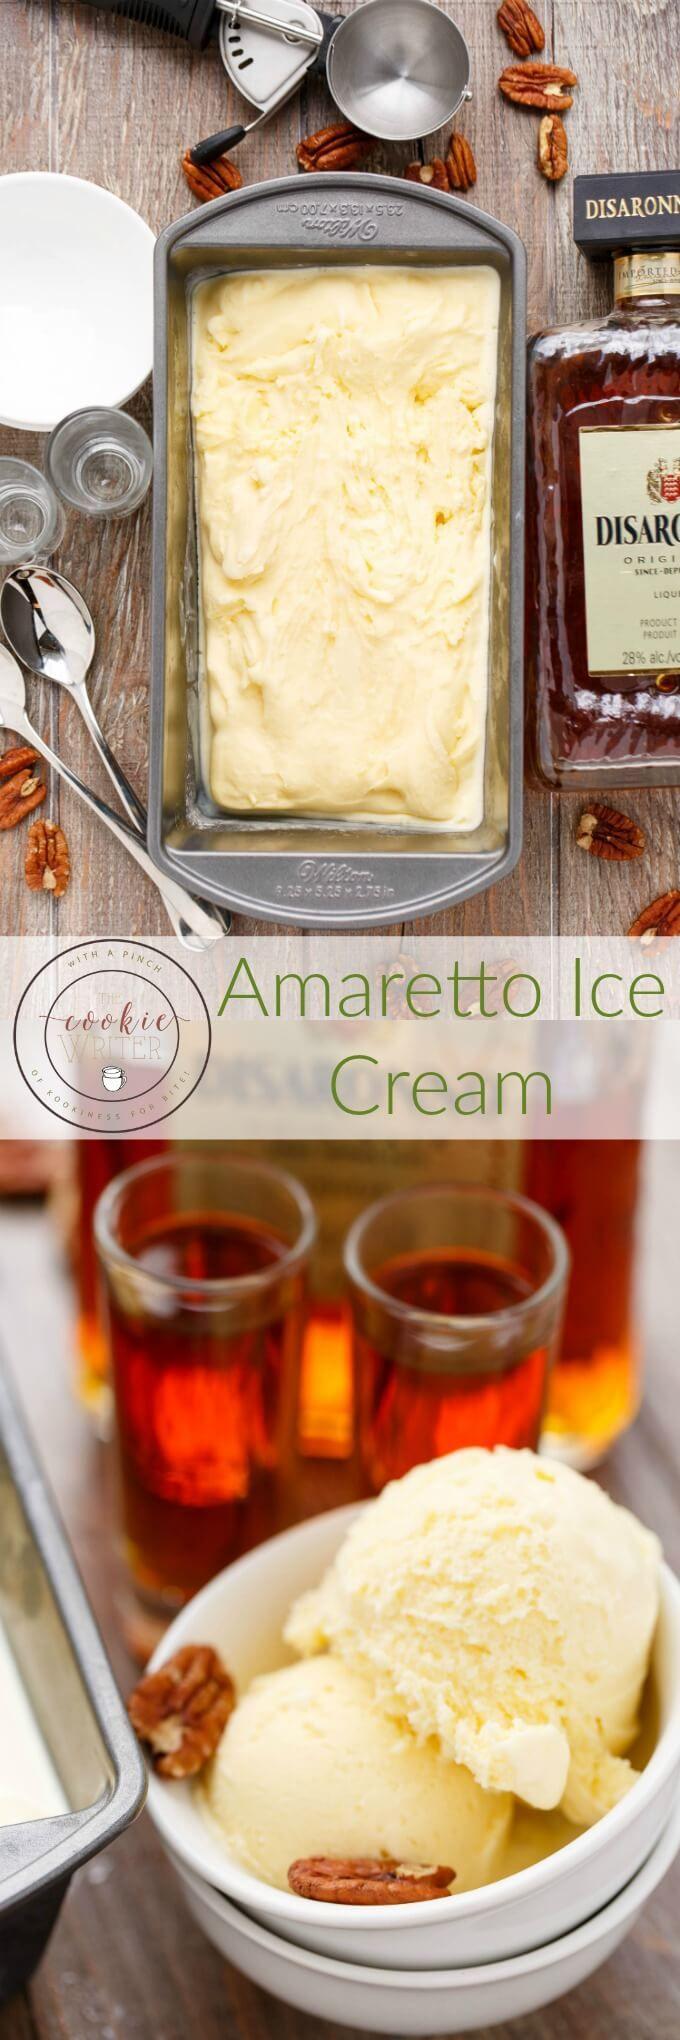 Amaretto Ice Cream   http://thecookiewriter.com   @thecookiewriter   #icecream